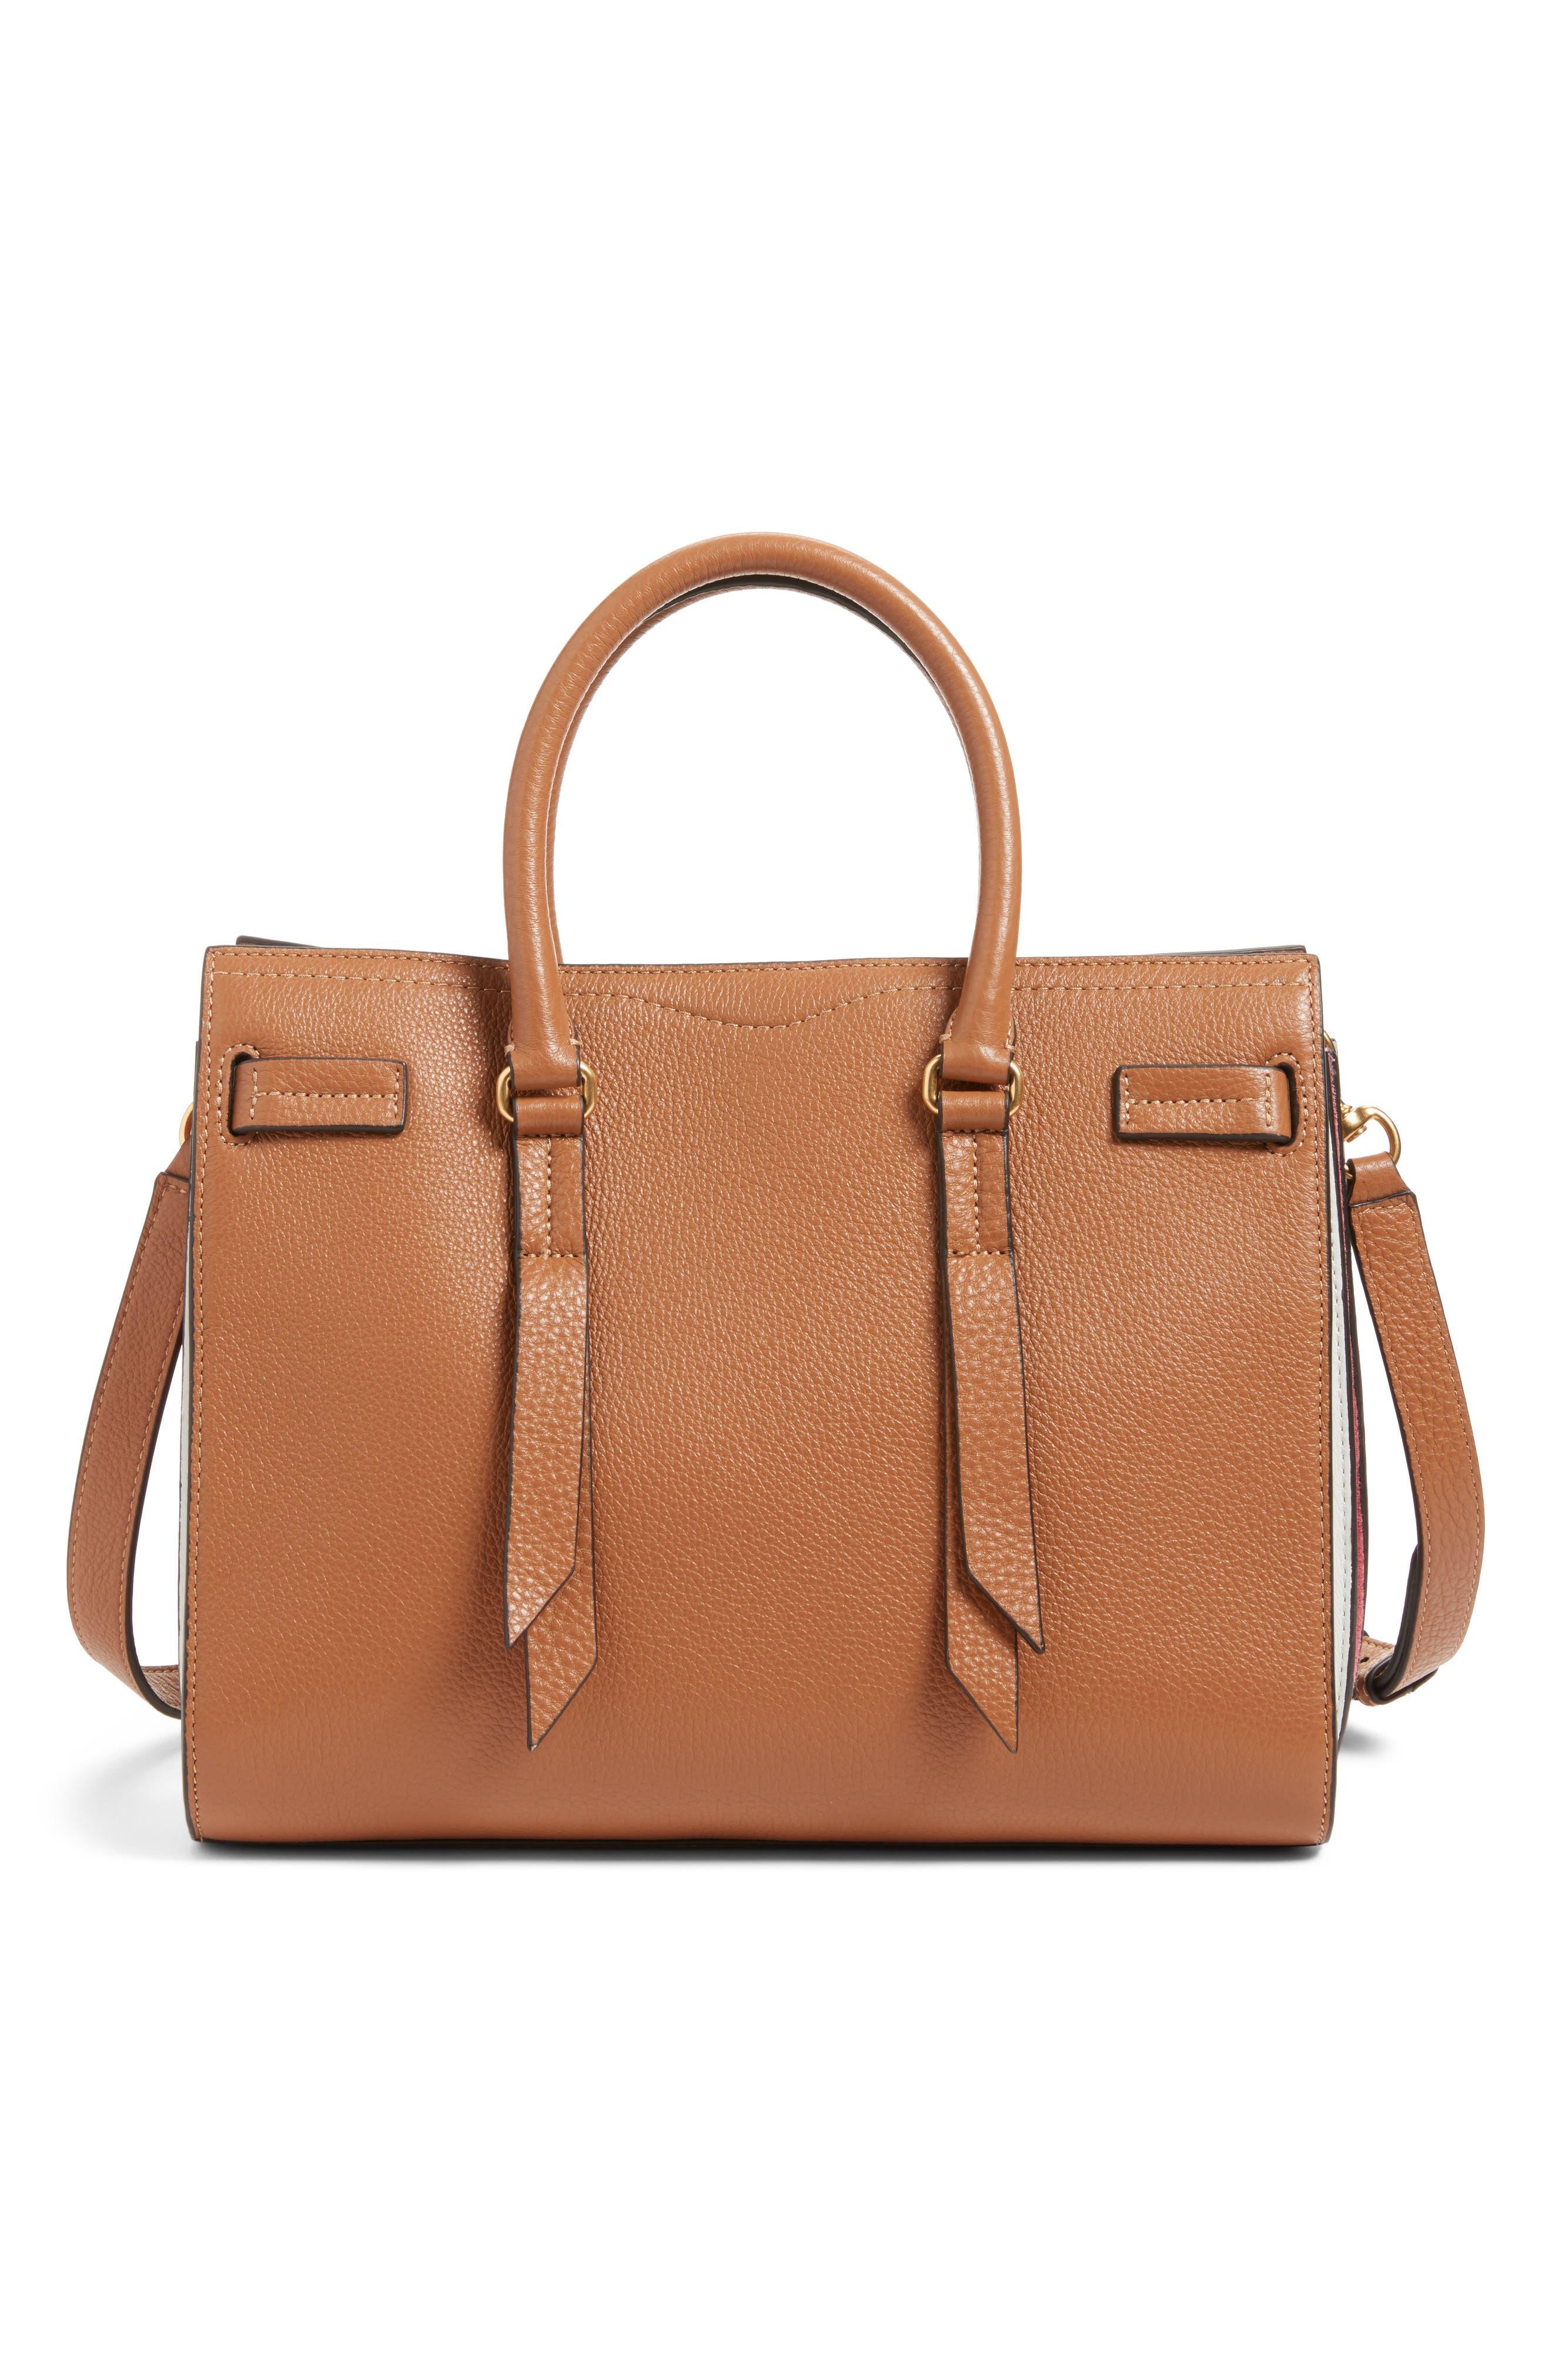 Sherry Calfskin Leather Satchel,                         Main,                         color, Almond Multi